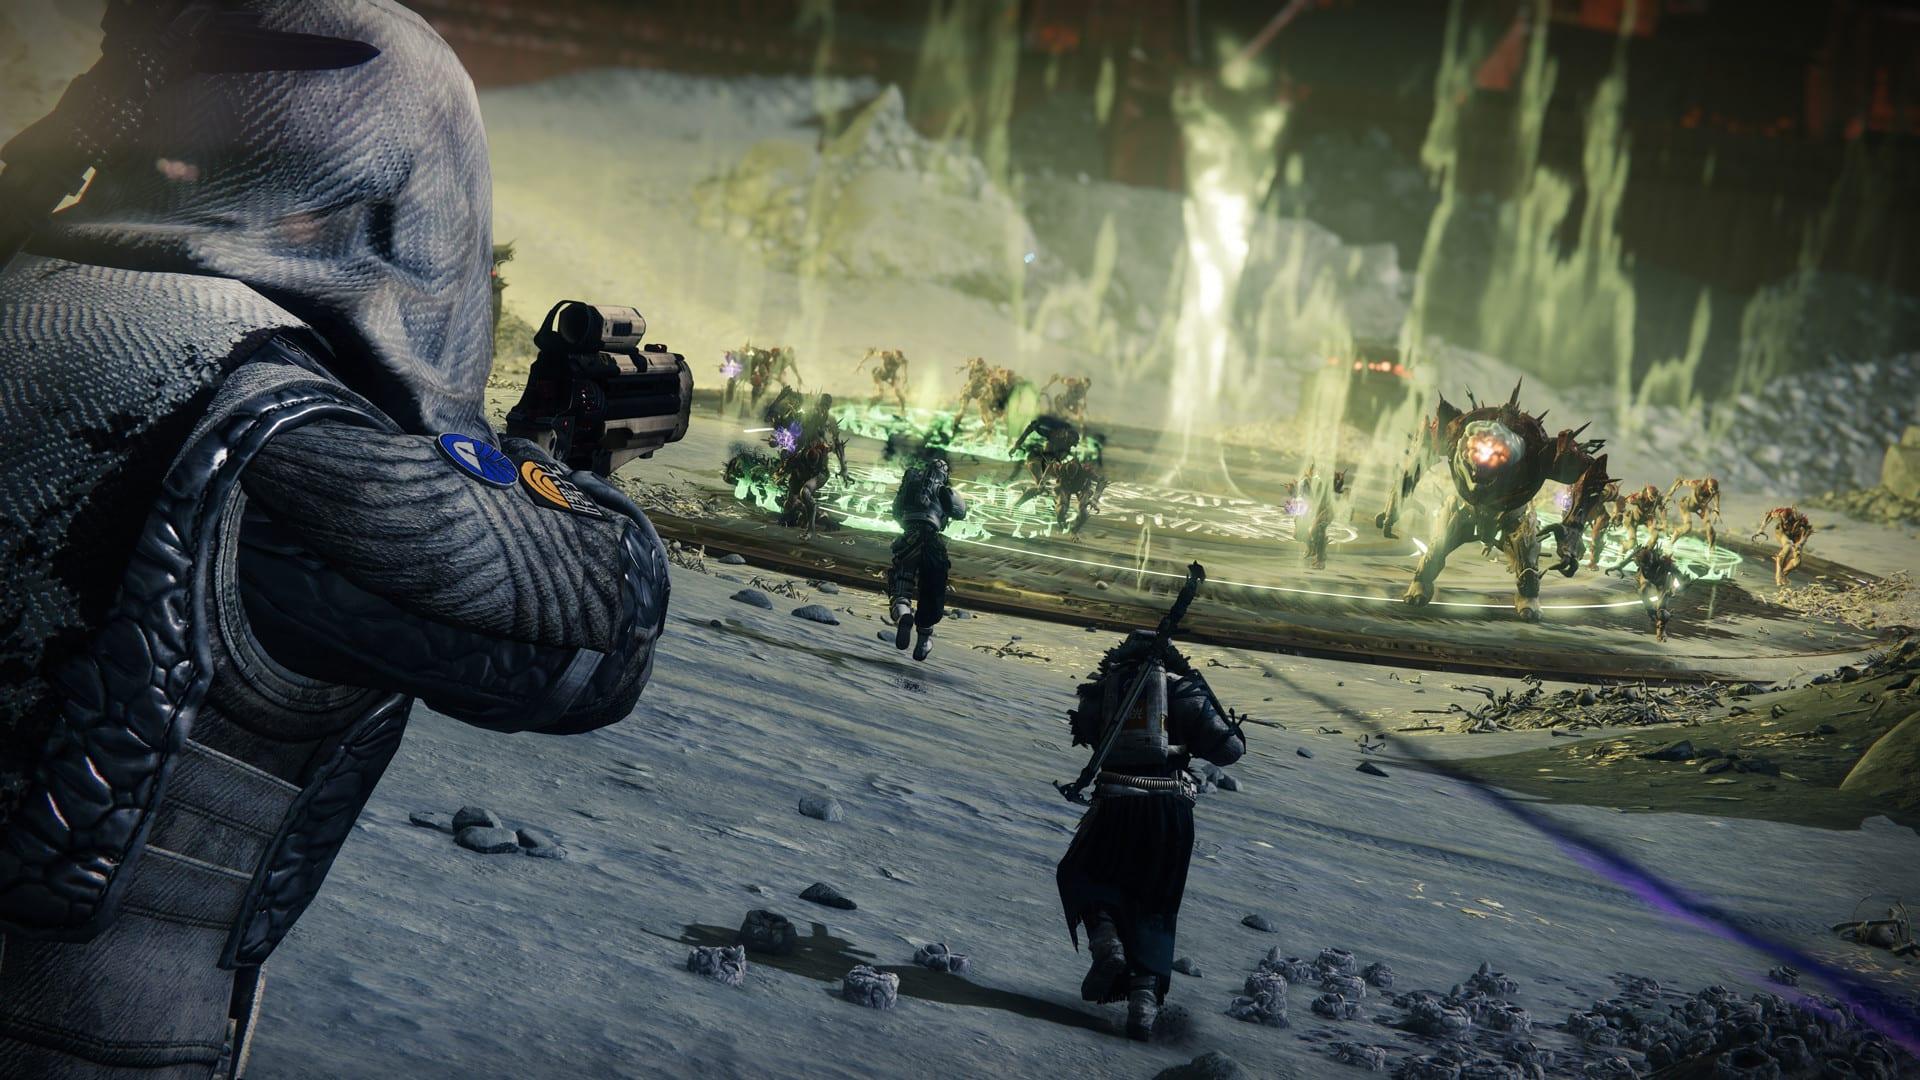 destiny 2, prophecy location